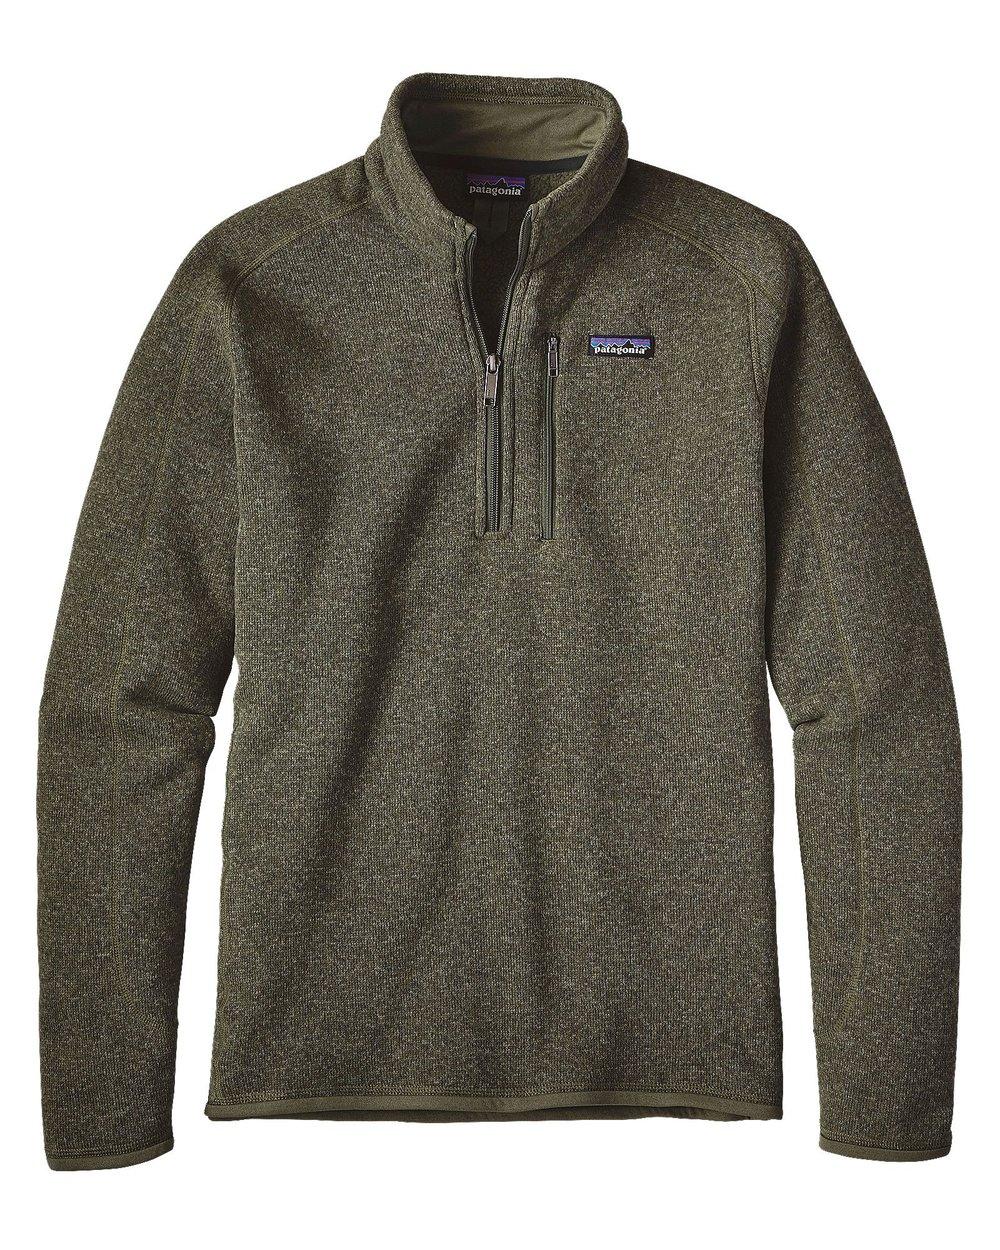 Fair Trade Pullover - Patagonia |$99